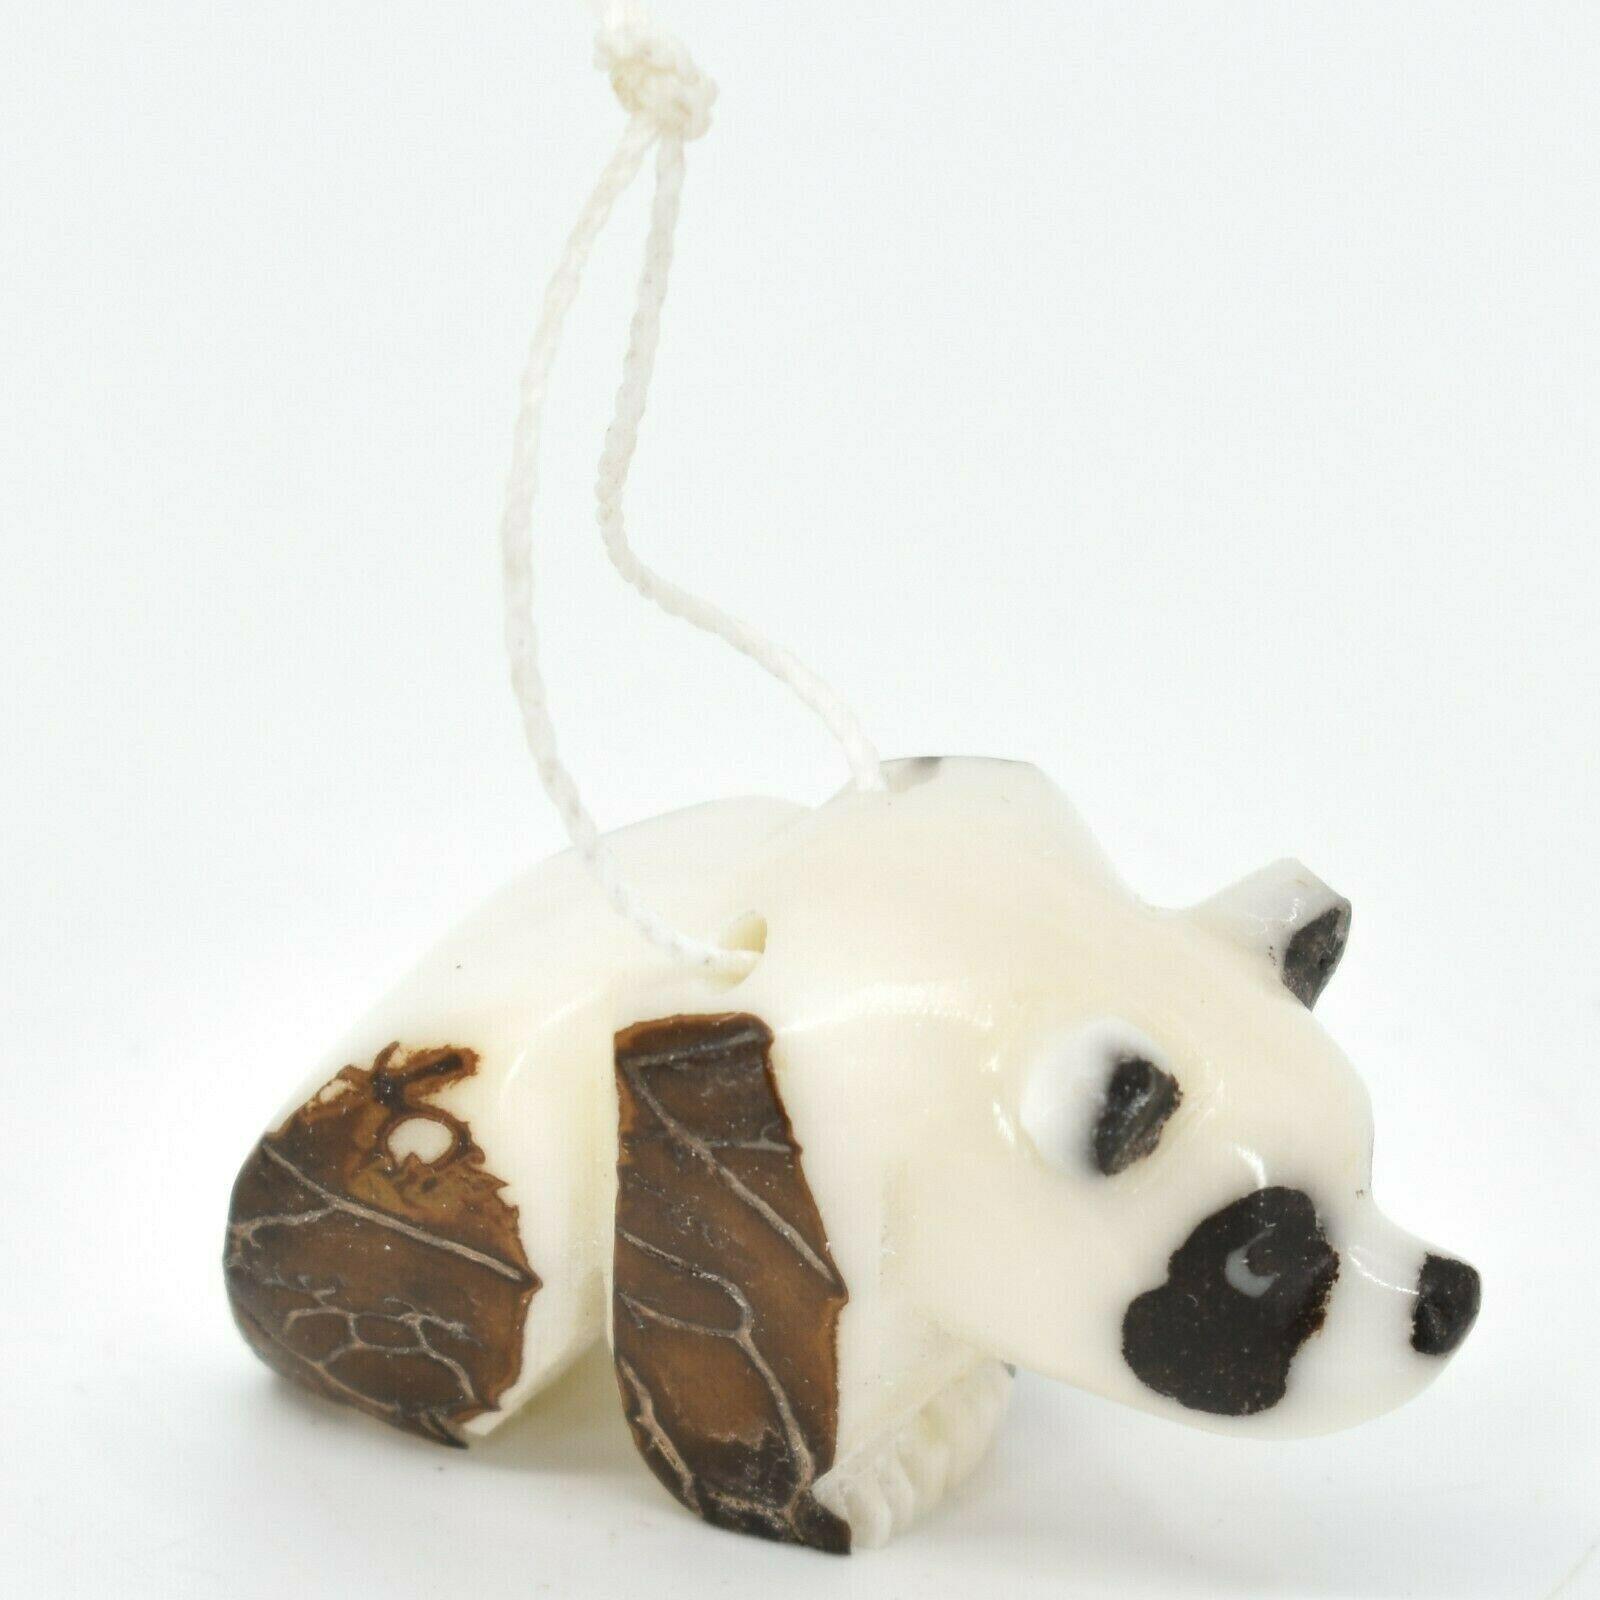 Hand Carved Tagua Nut Carving Small Panda Bear Ornament Handmade in Ecuador